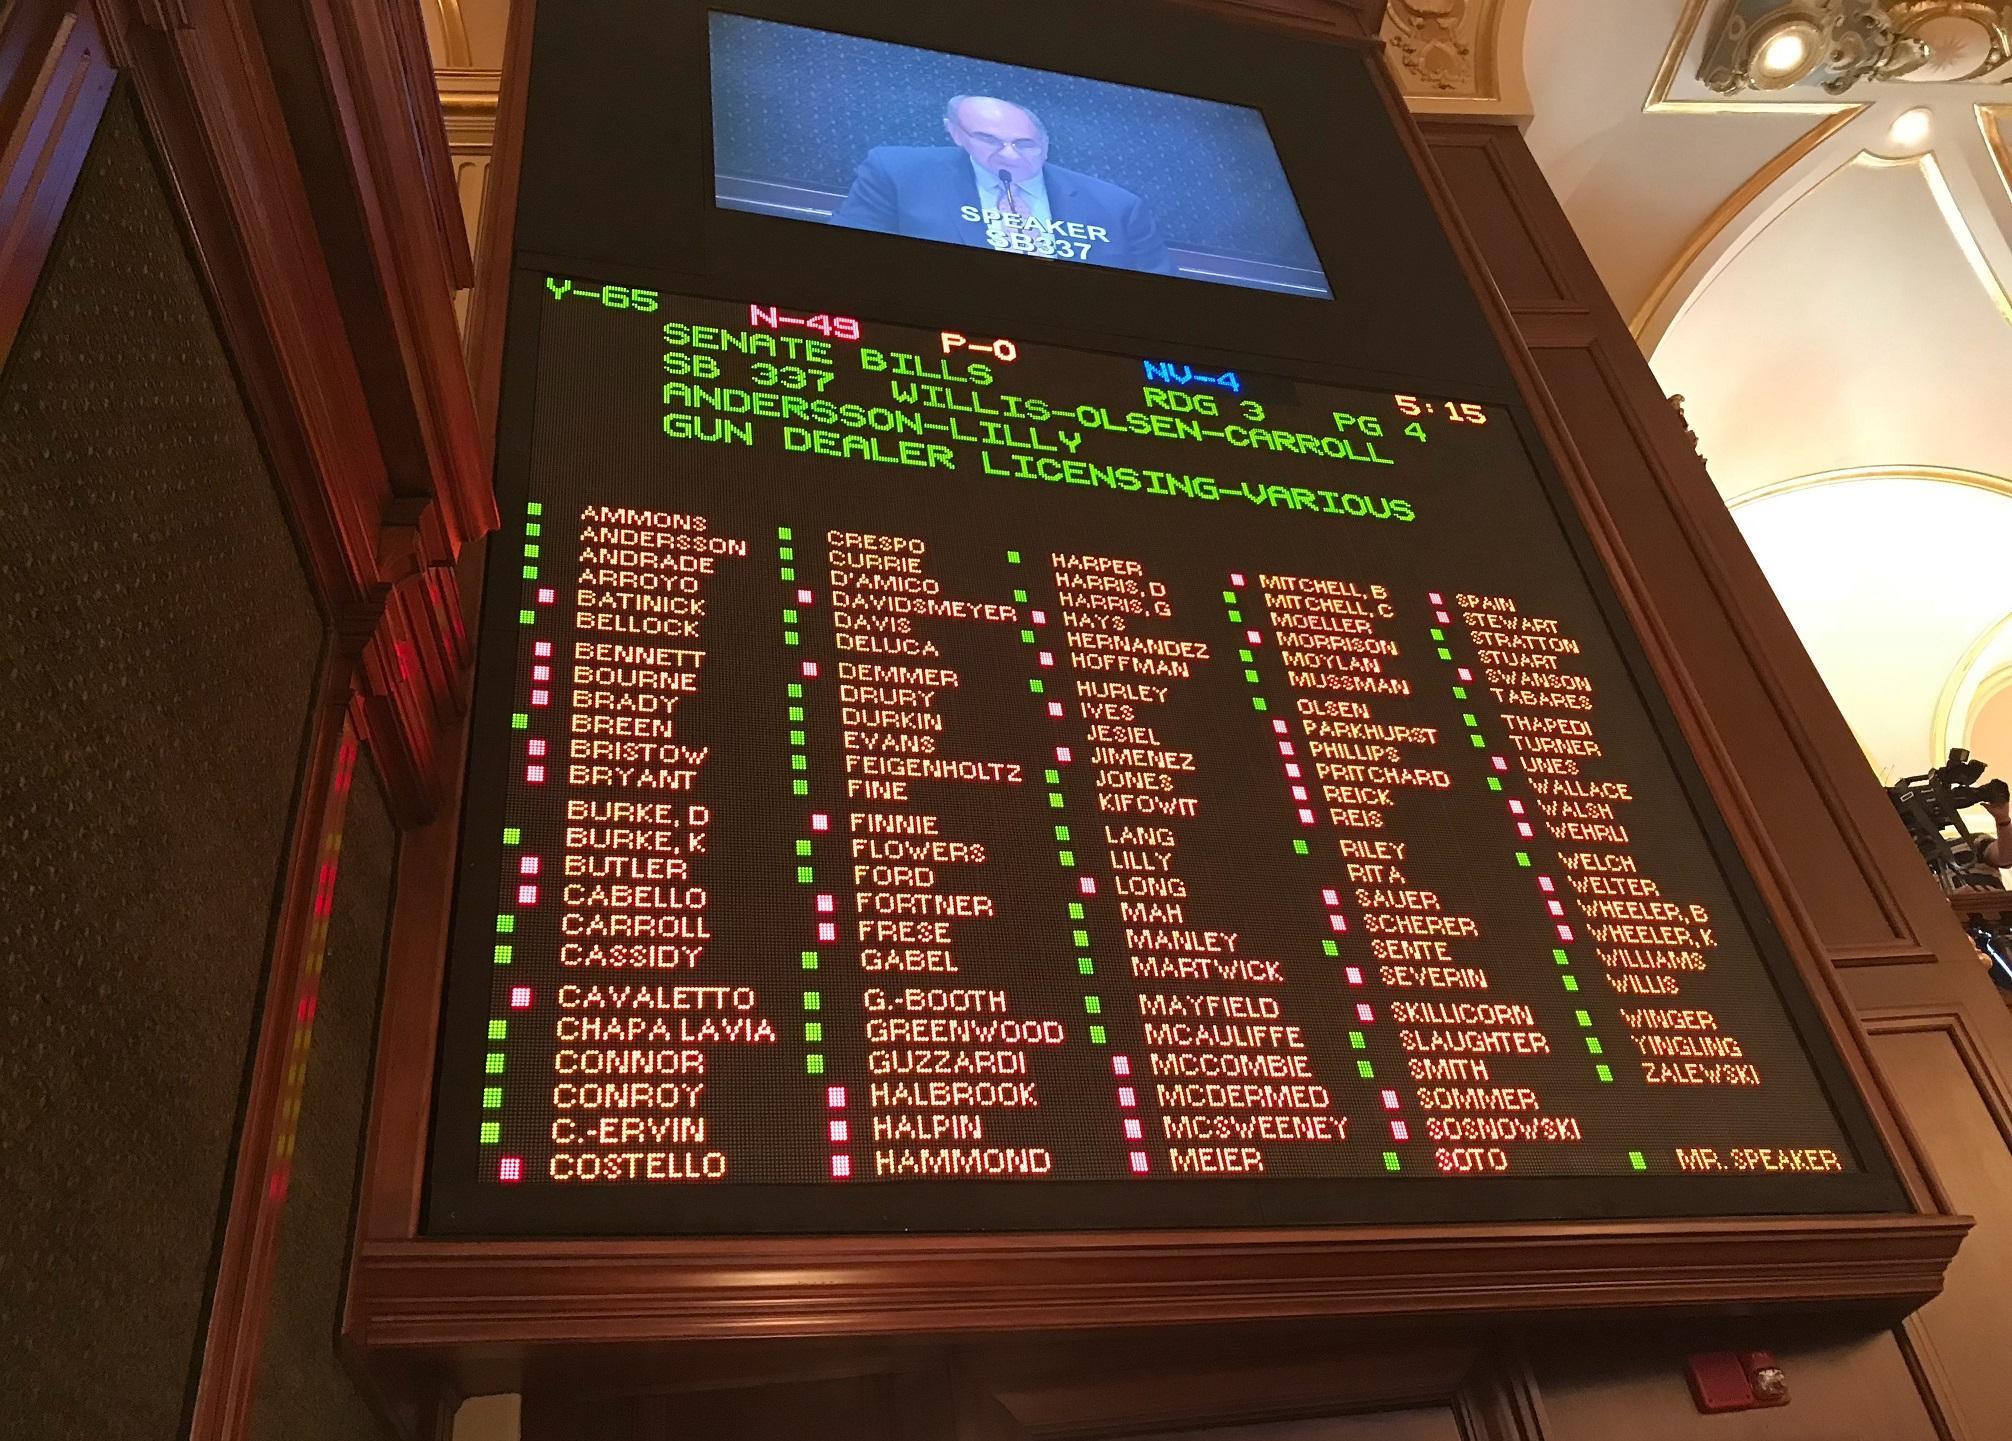 Revamped Gun Dealer Licensing Bill Okd By Illinois Statehouse Npr